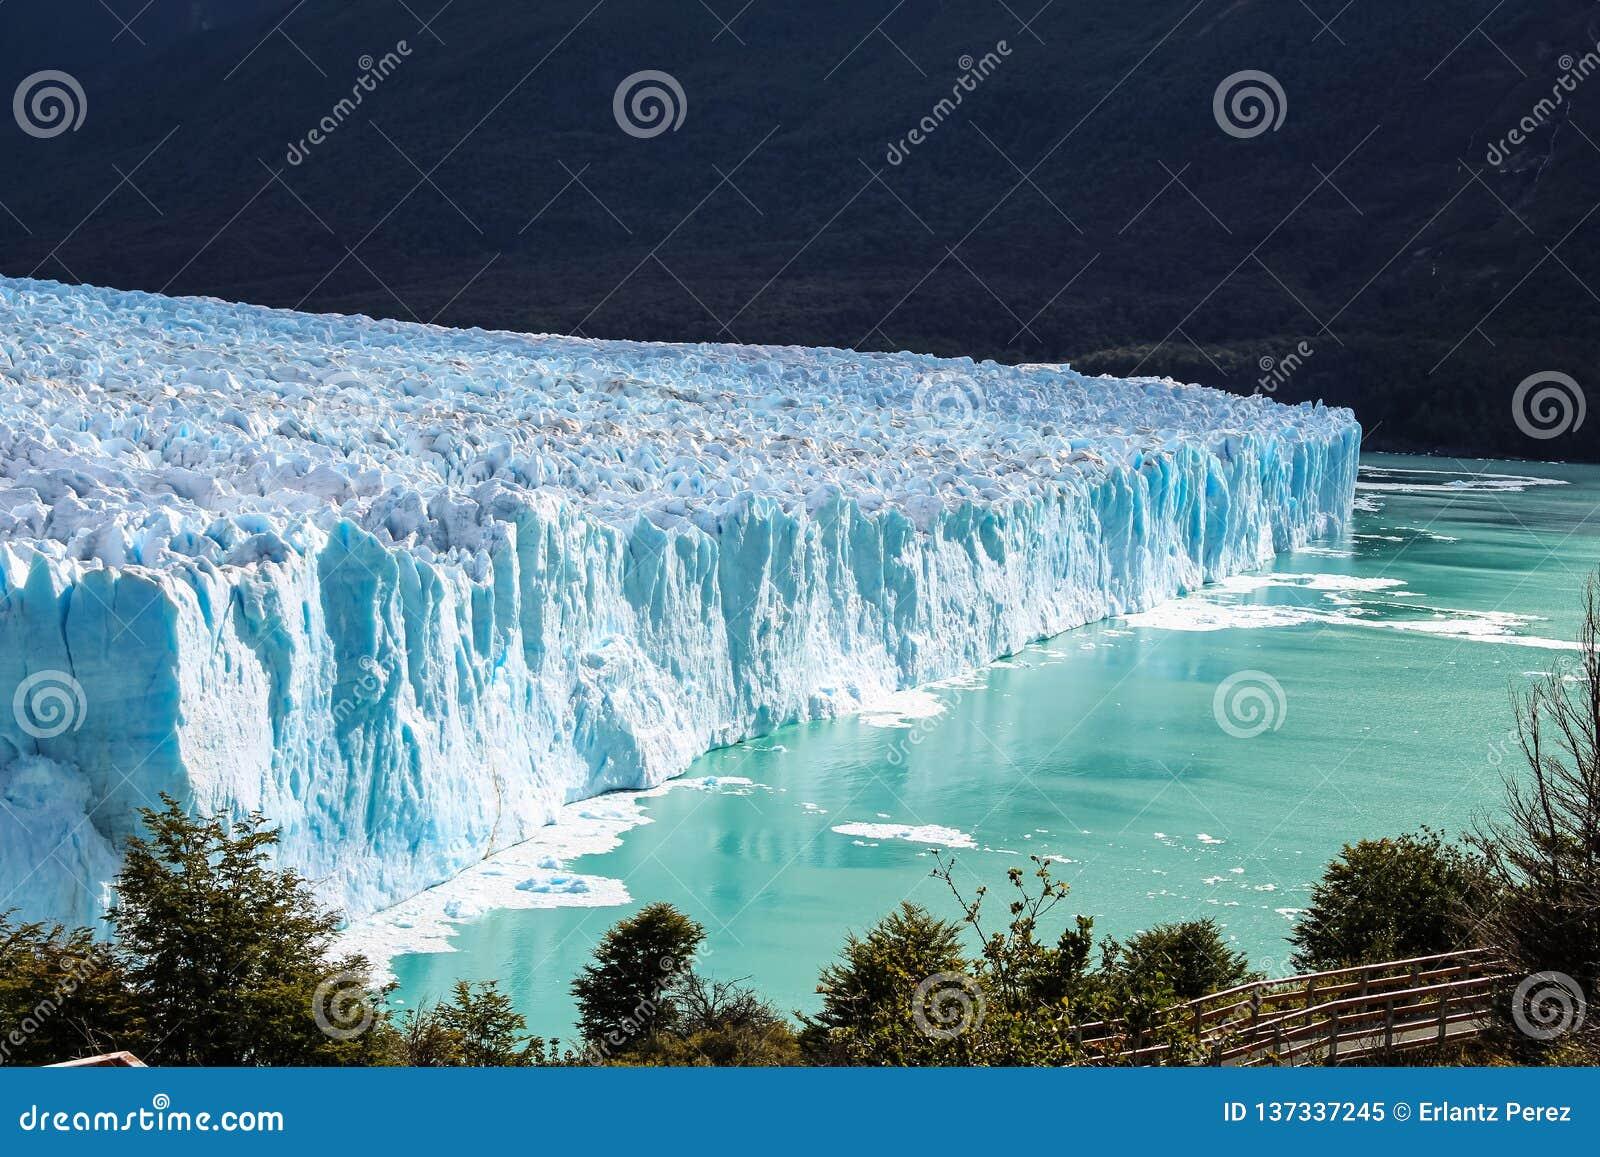 Amazing high view of the Glacier Perito Moreno National Park in Patagonia, Argentina